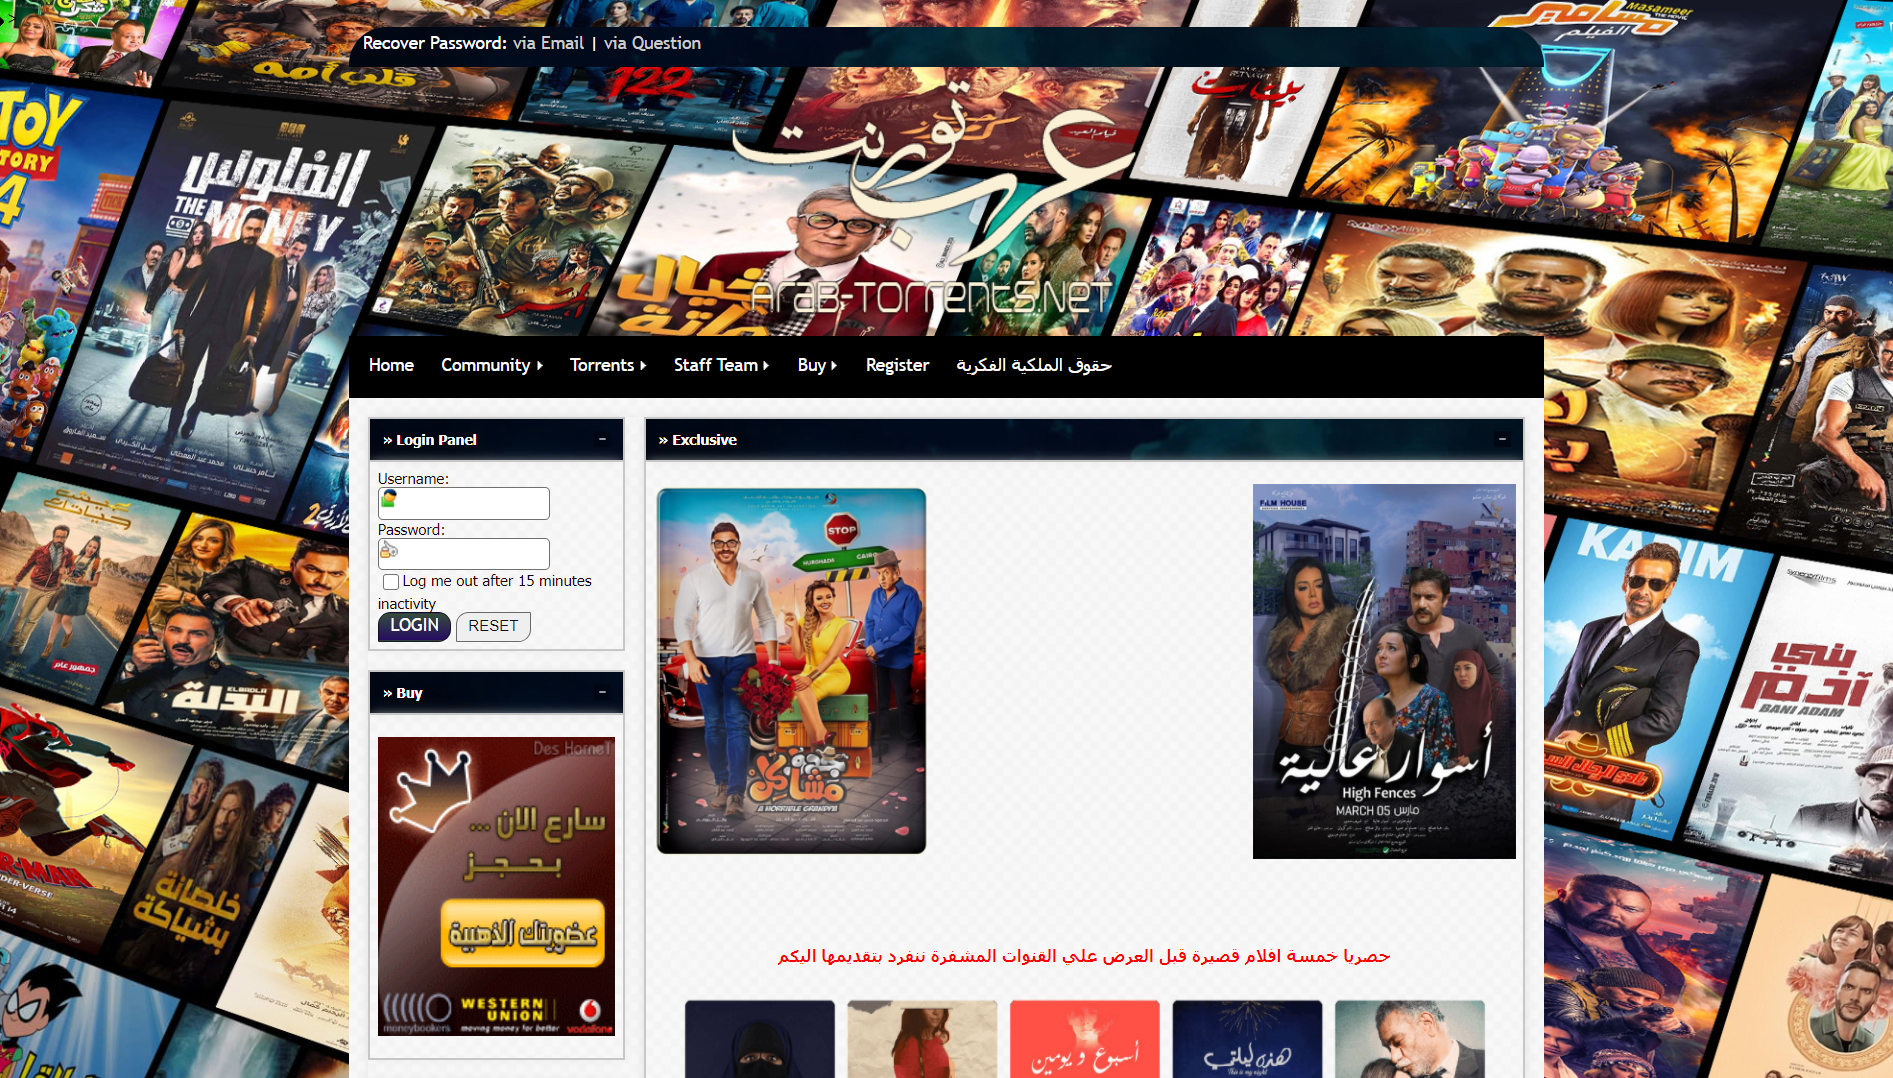 arab-torrents website image